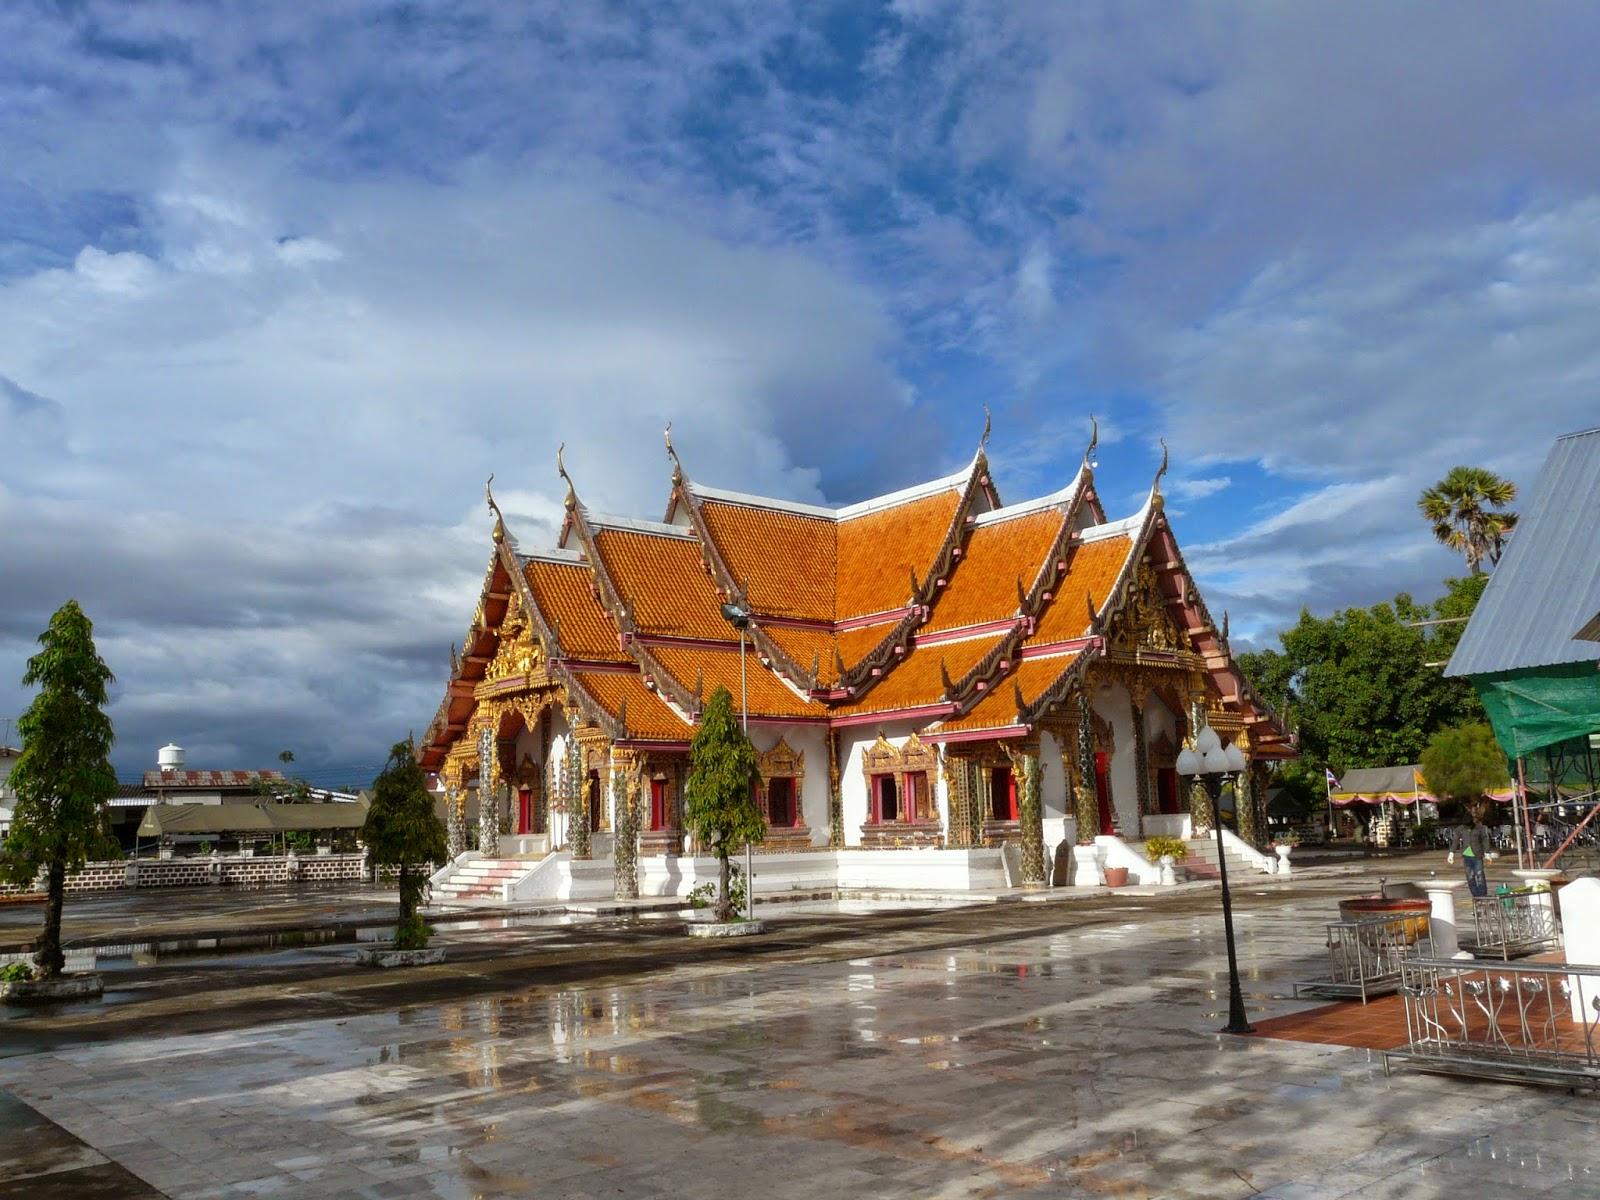 Wat Phra That Choeng Chum in Sakhon Nakhon